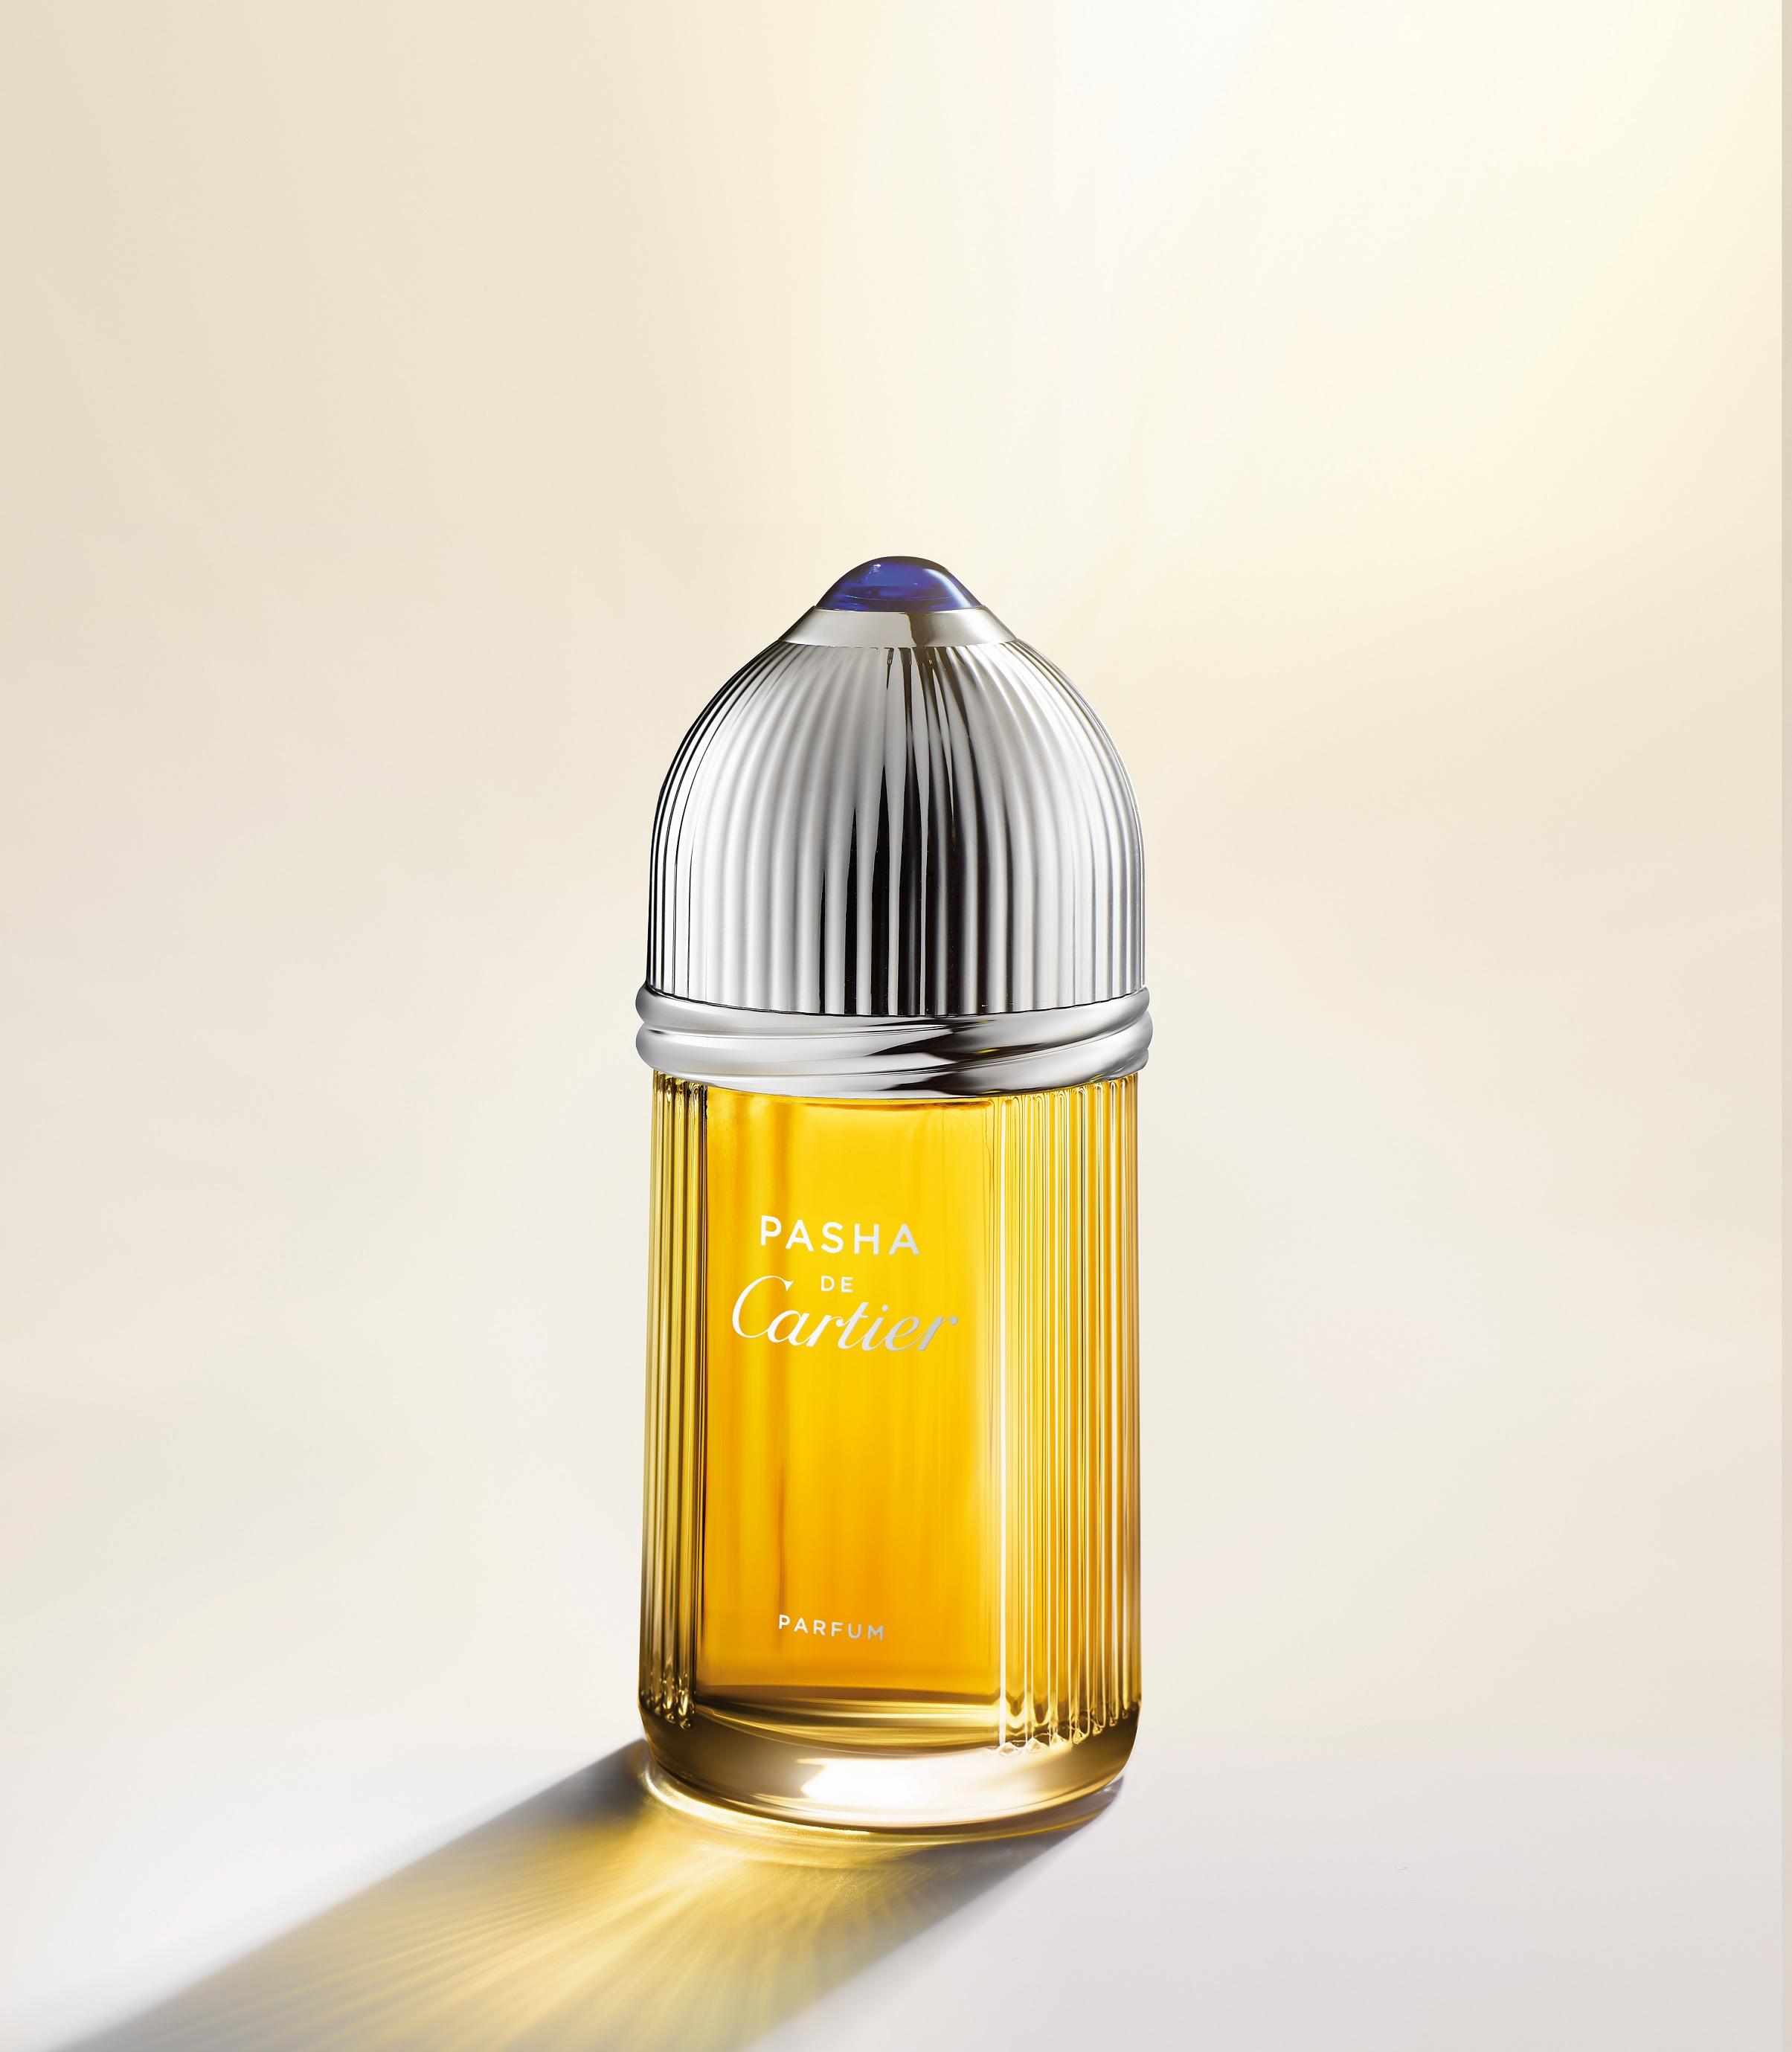 Cartier-Pasha-Parfum-Flacon